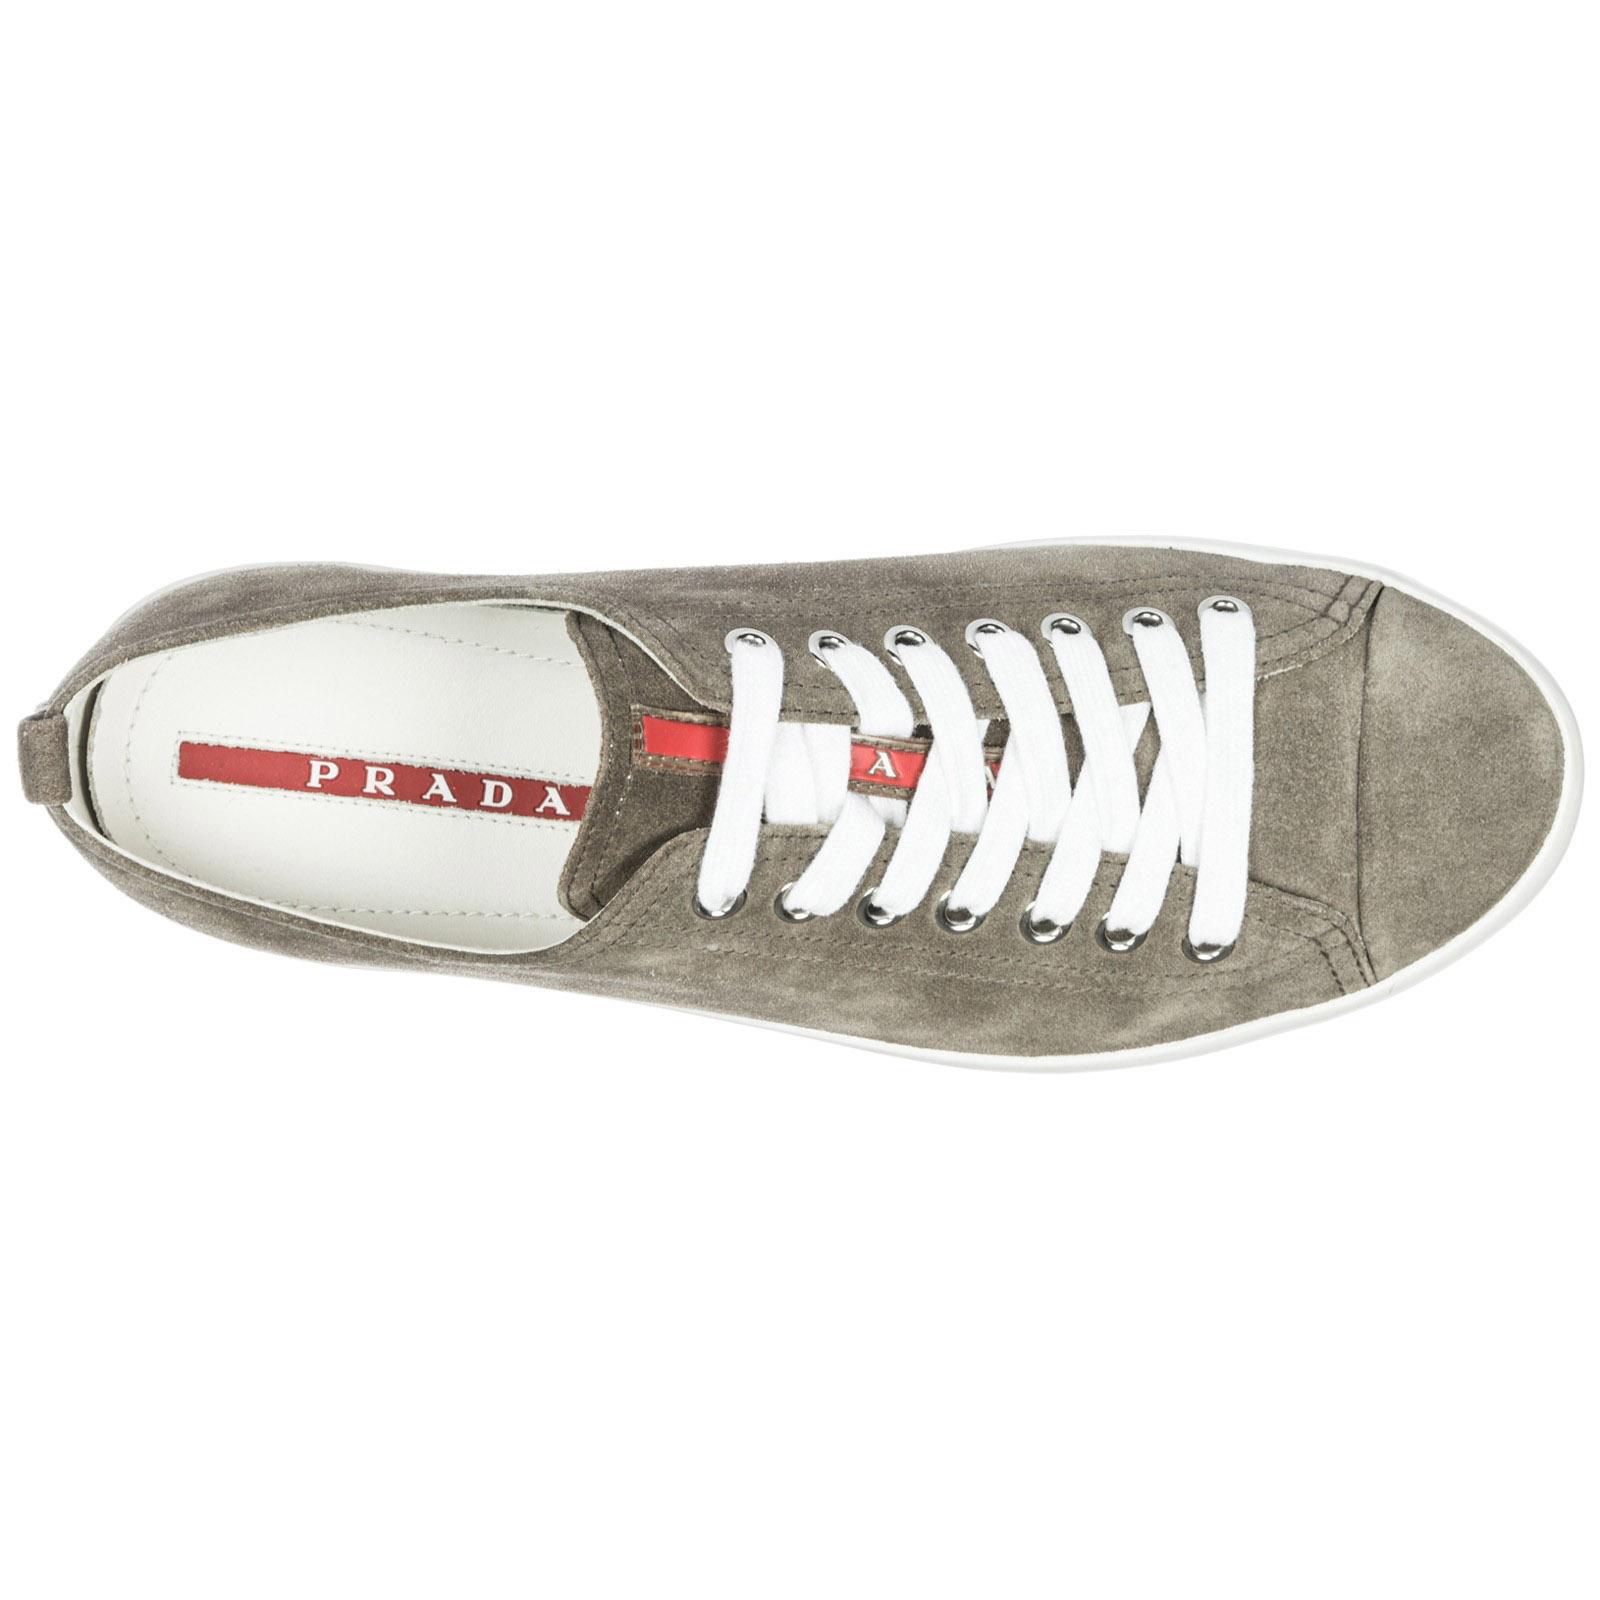 bianco F052N Sneakers 4E2406 Prada OW2 grigio RBRO7qF